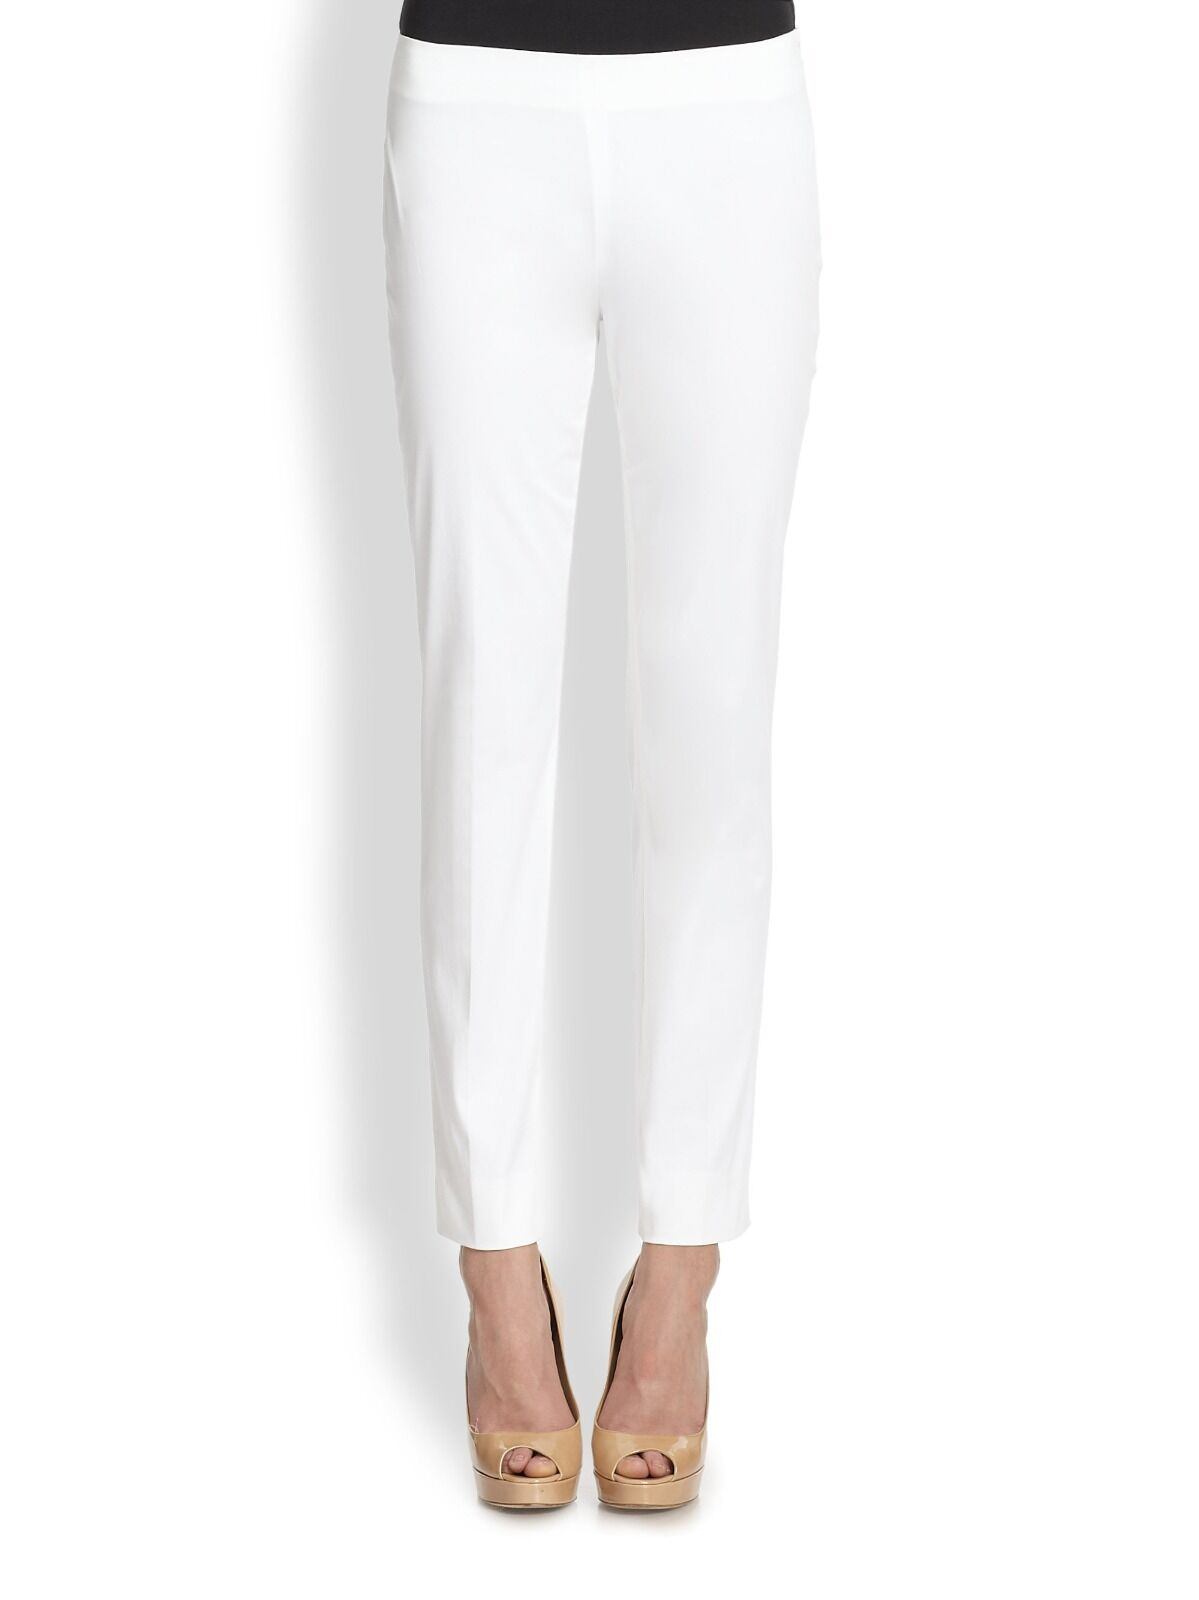 Elie Tahari White Jillian Flat Front Slim Elegant Dress Pants. NWT Sz.6